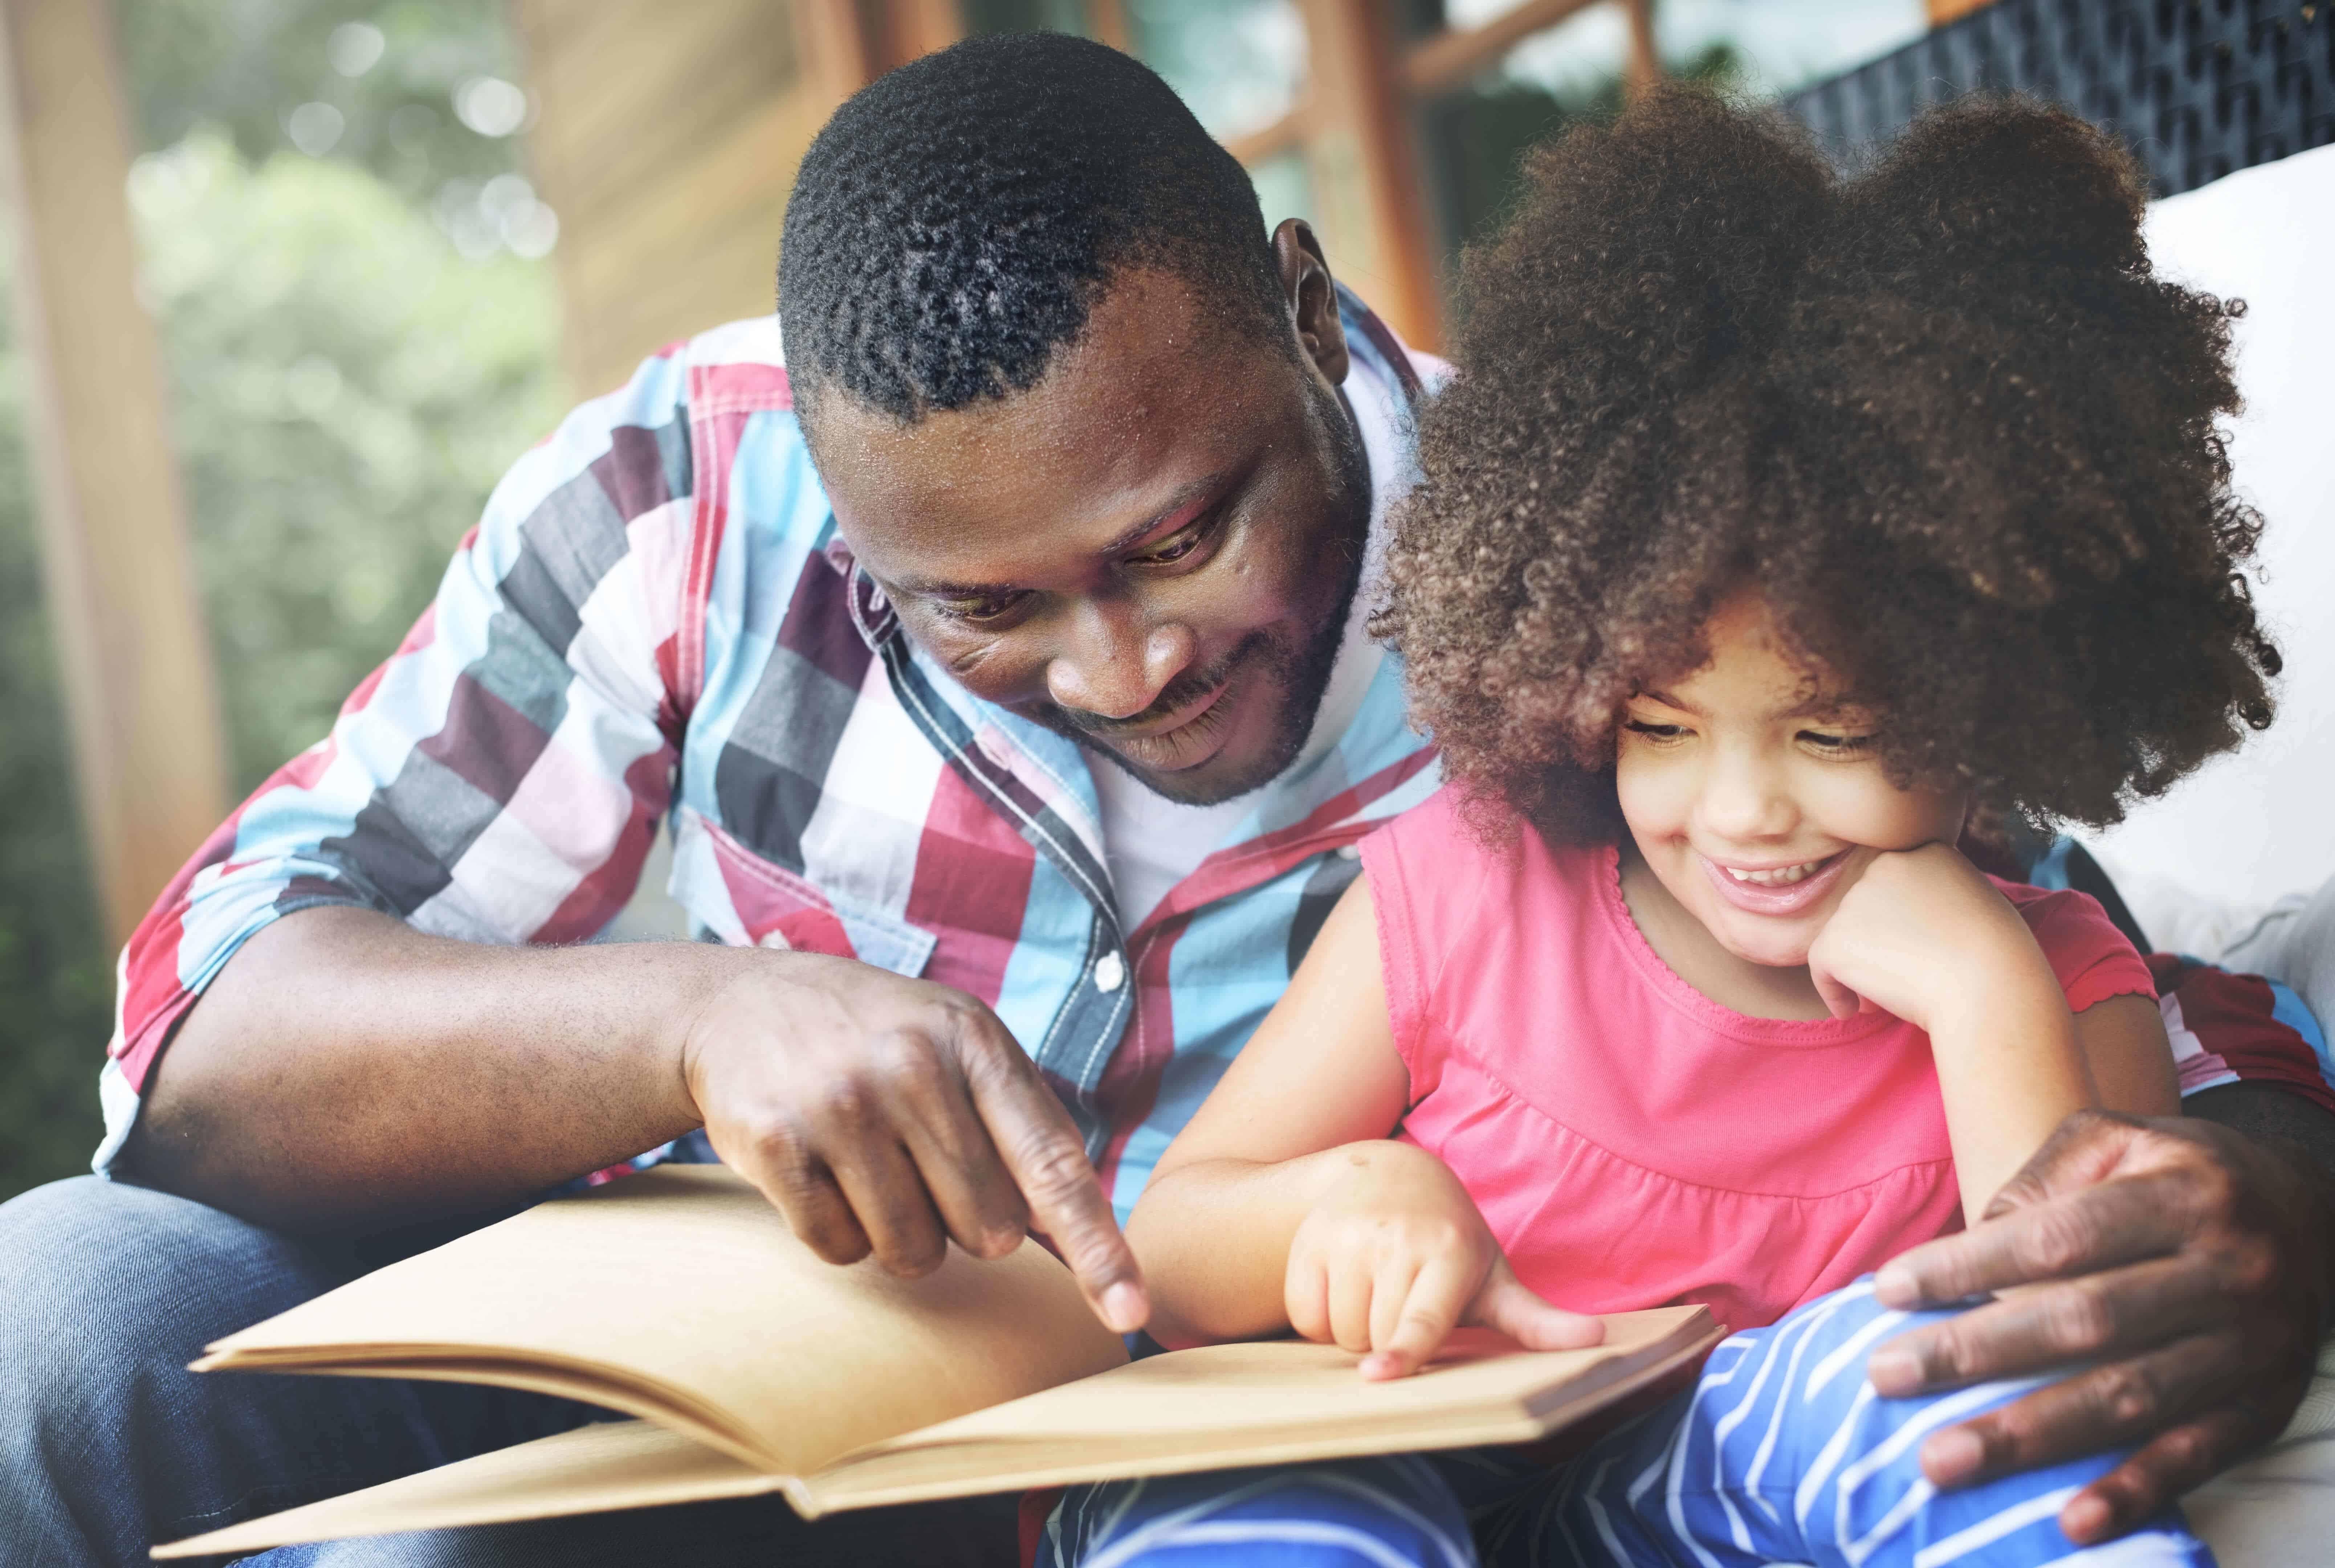 inspire children to read